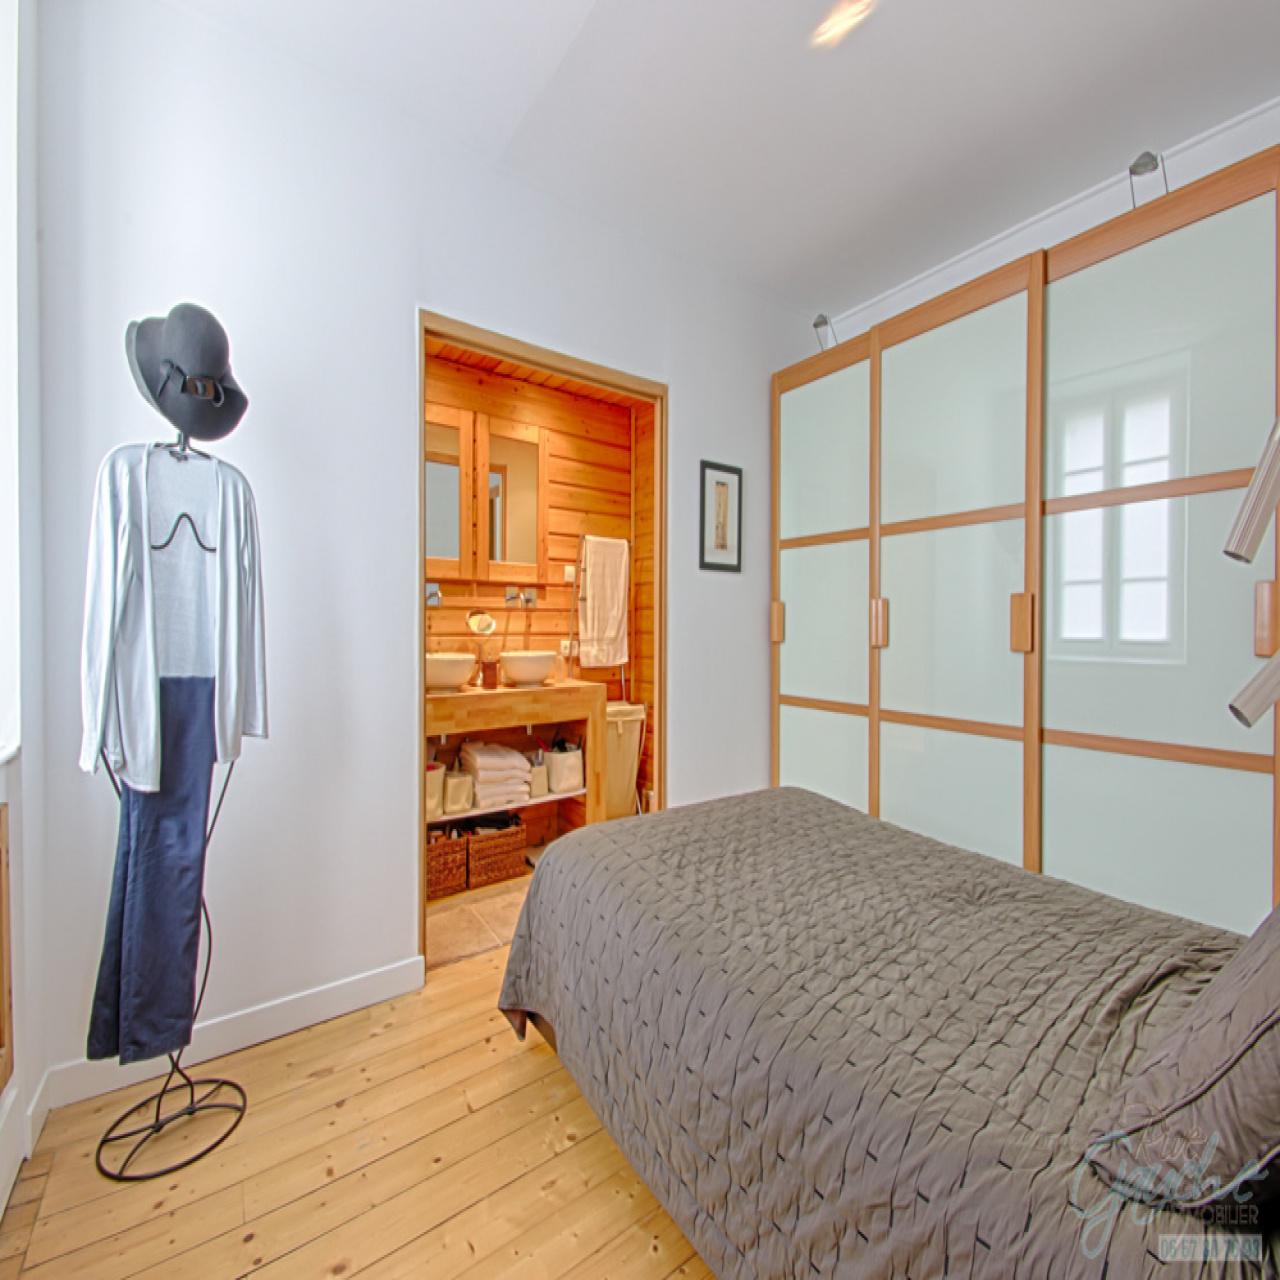 Image_8, Appartement, Cran-Gevrier, ref :FI3175